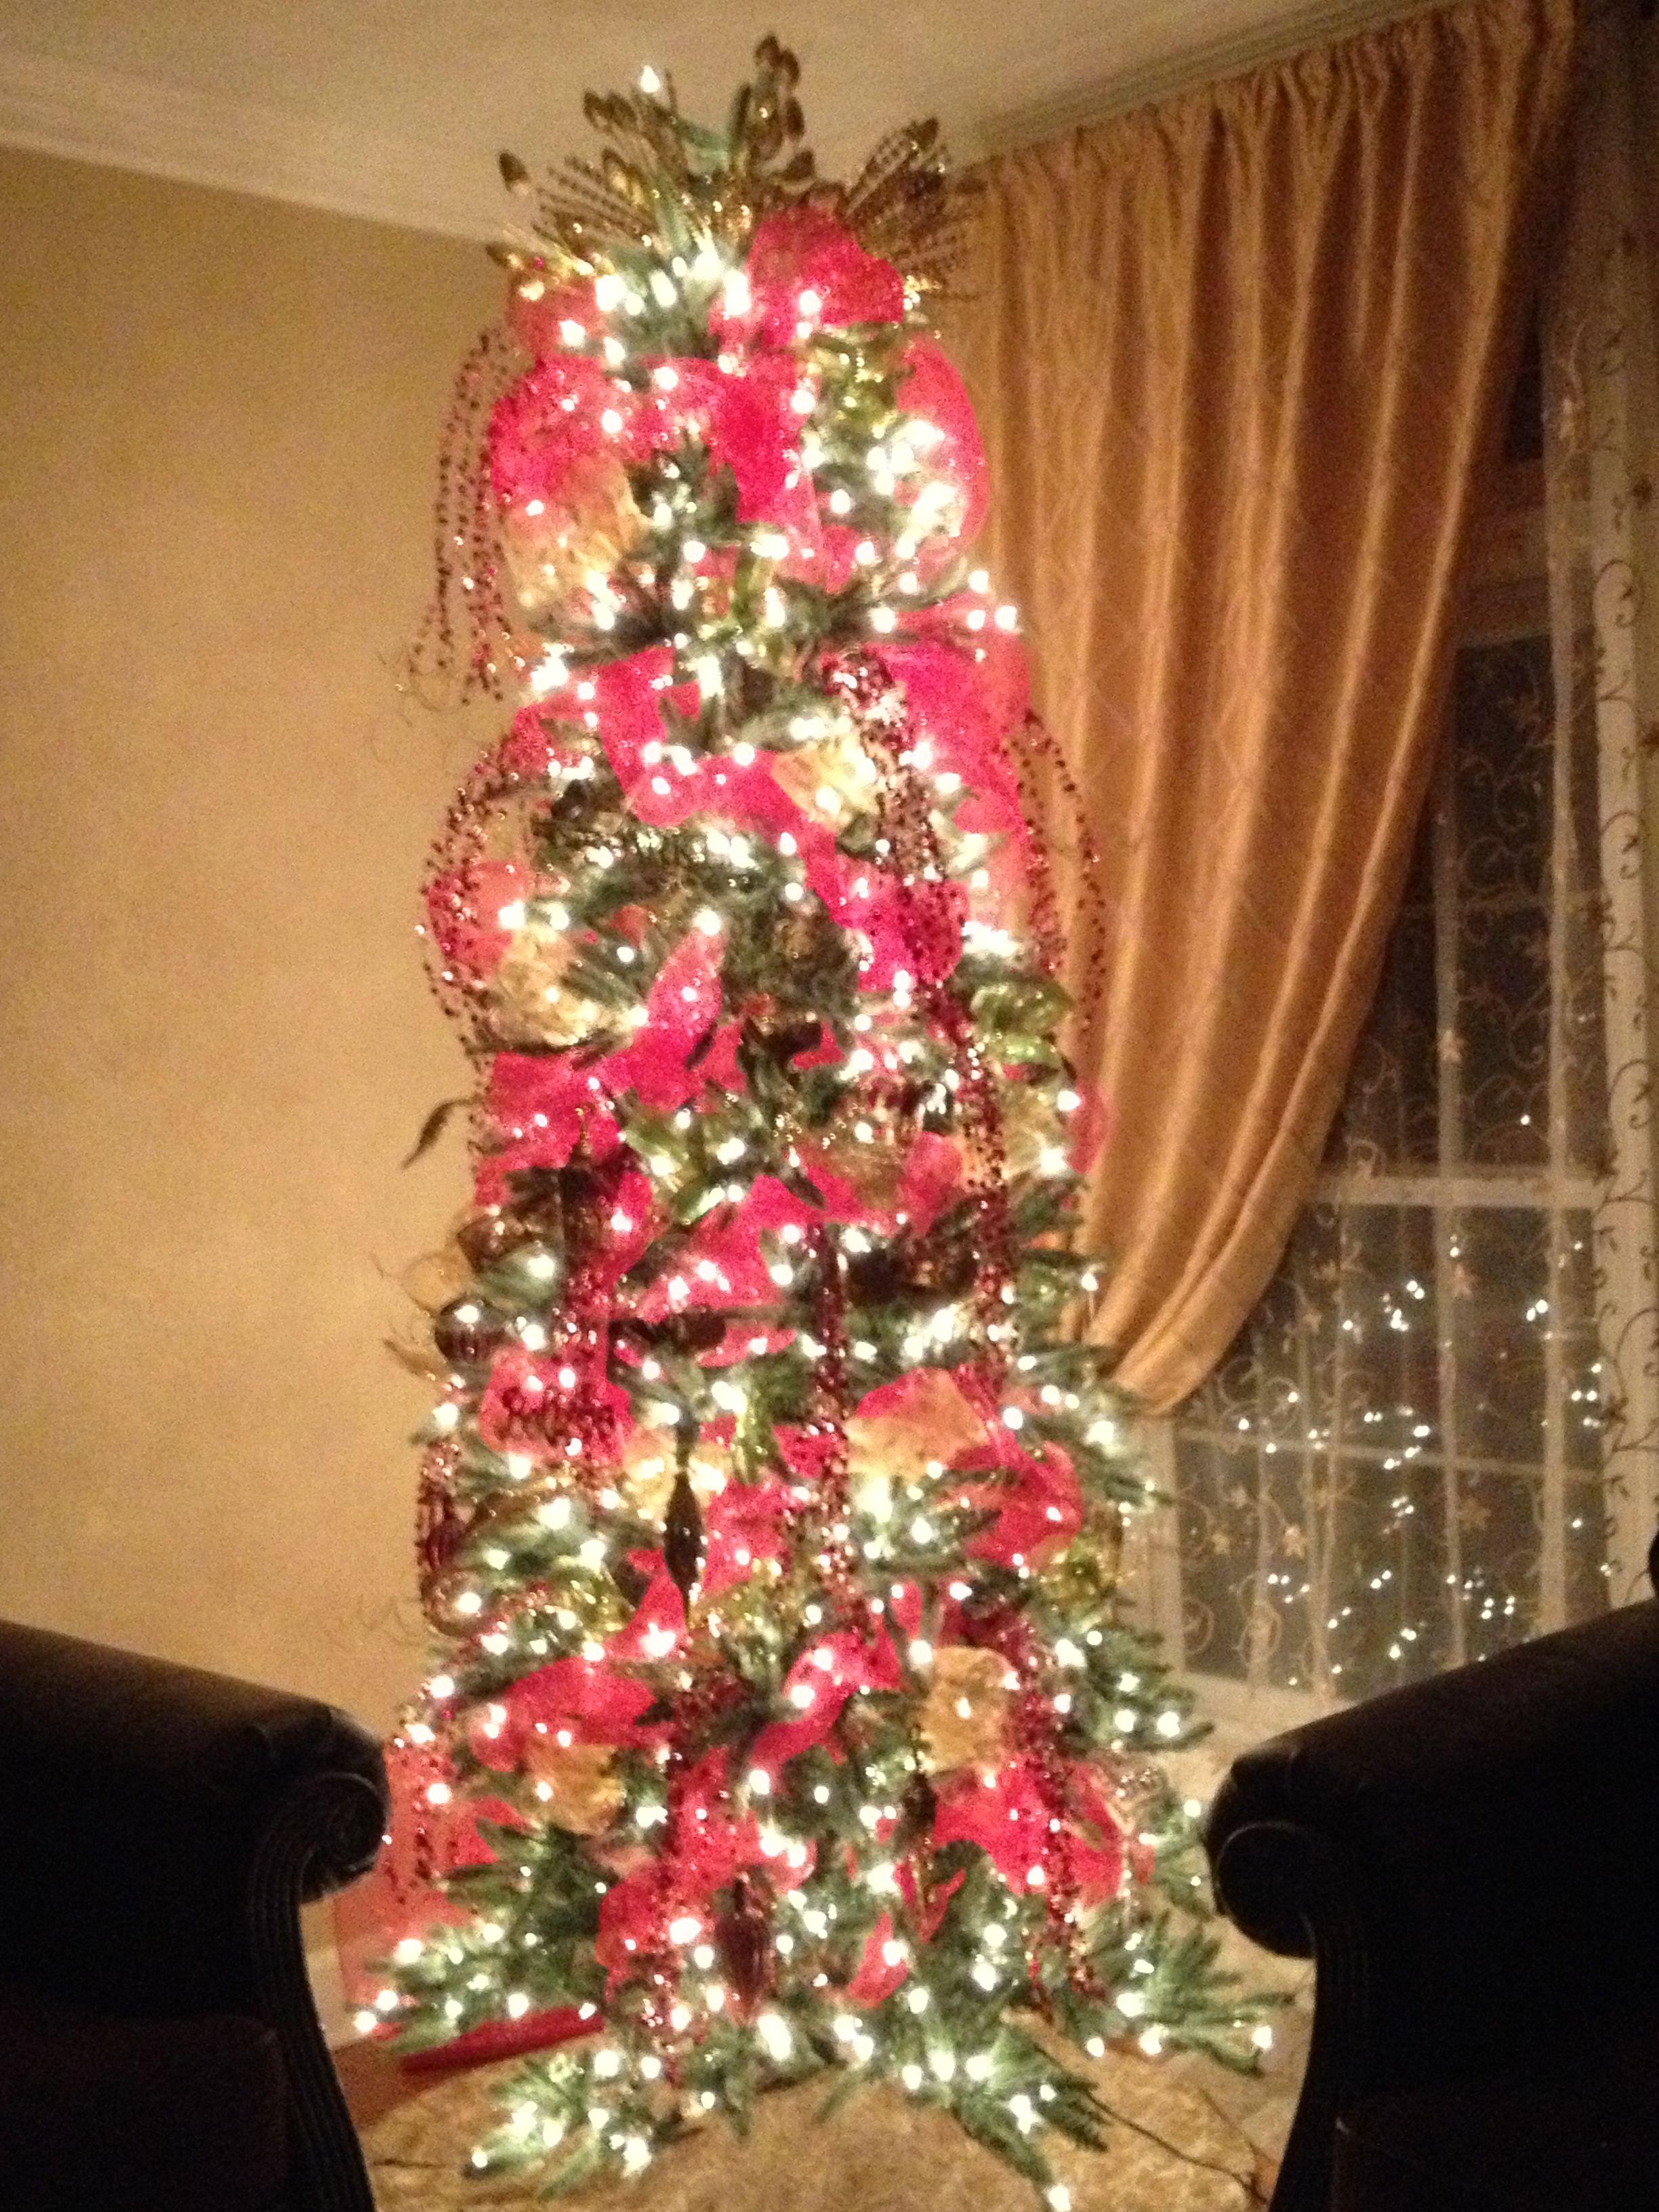 My confetti Christmas tree